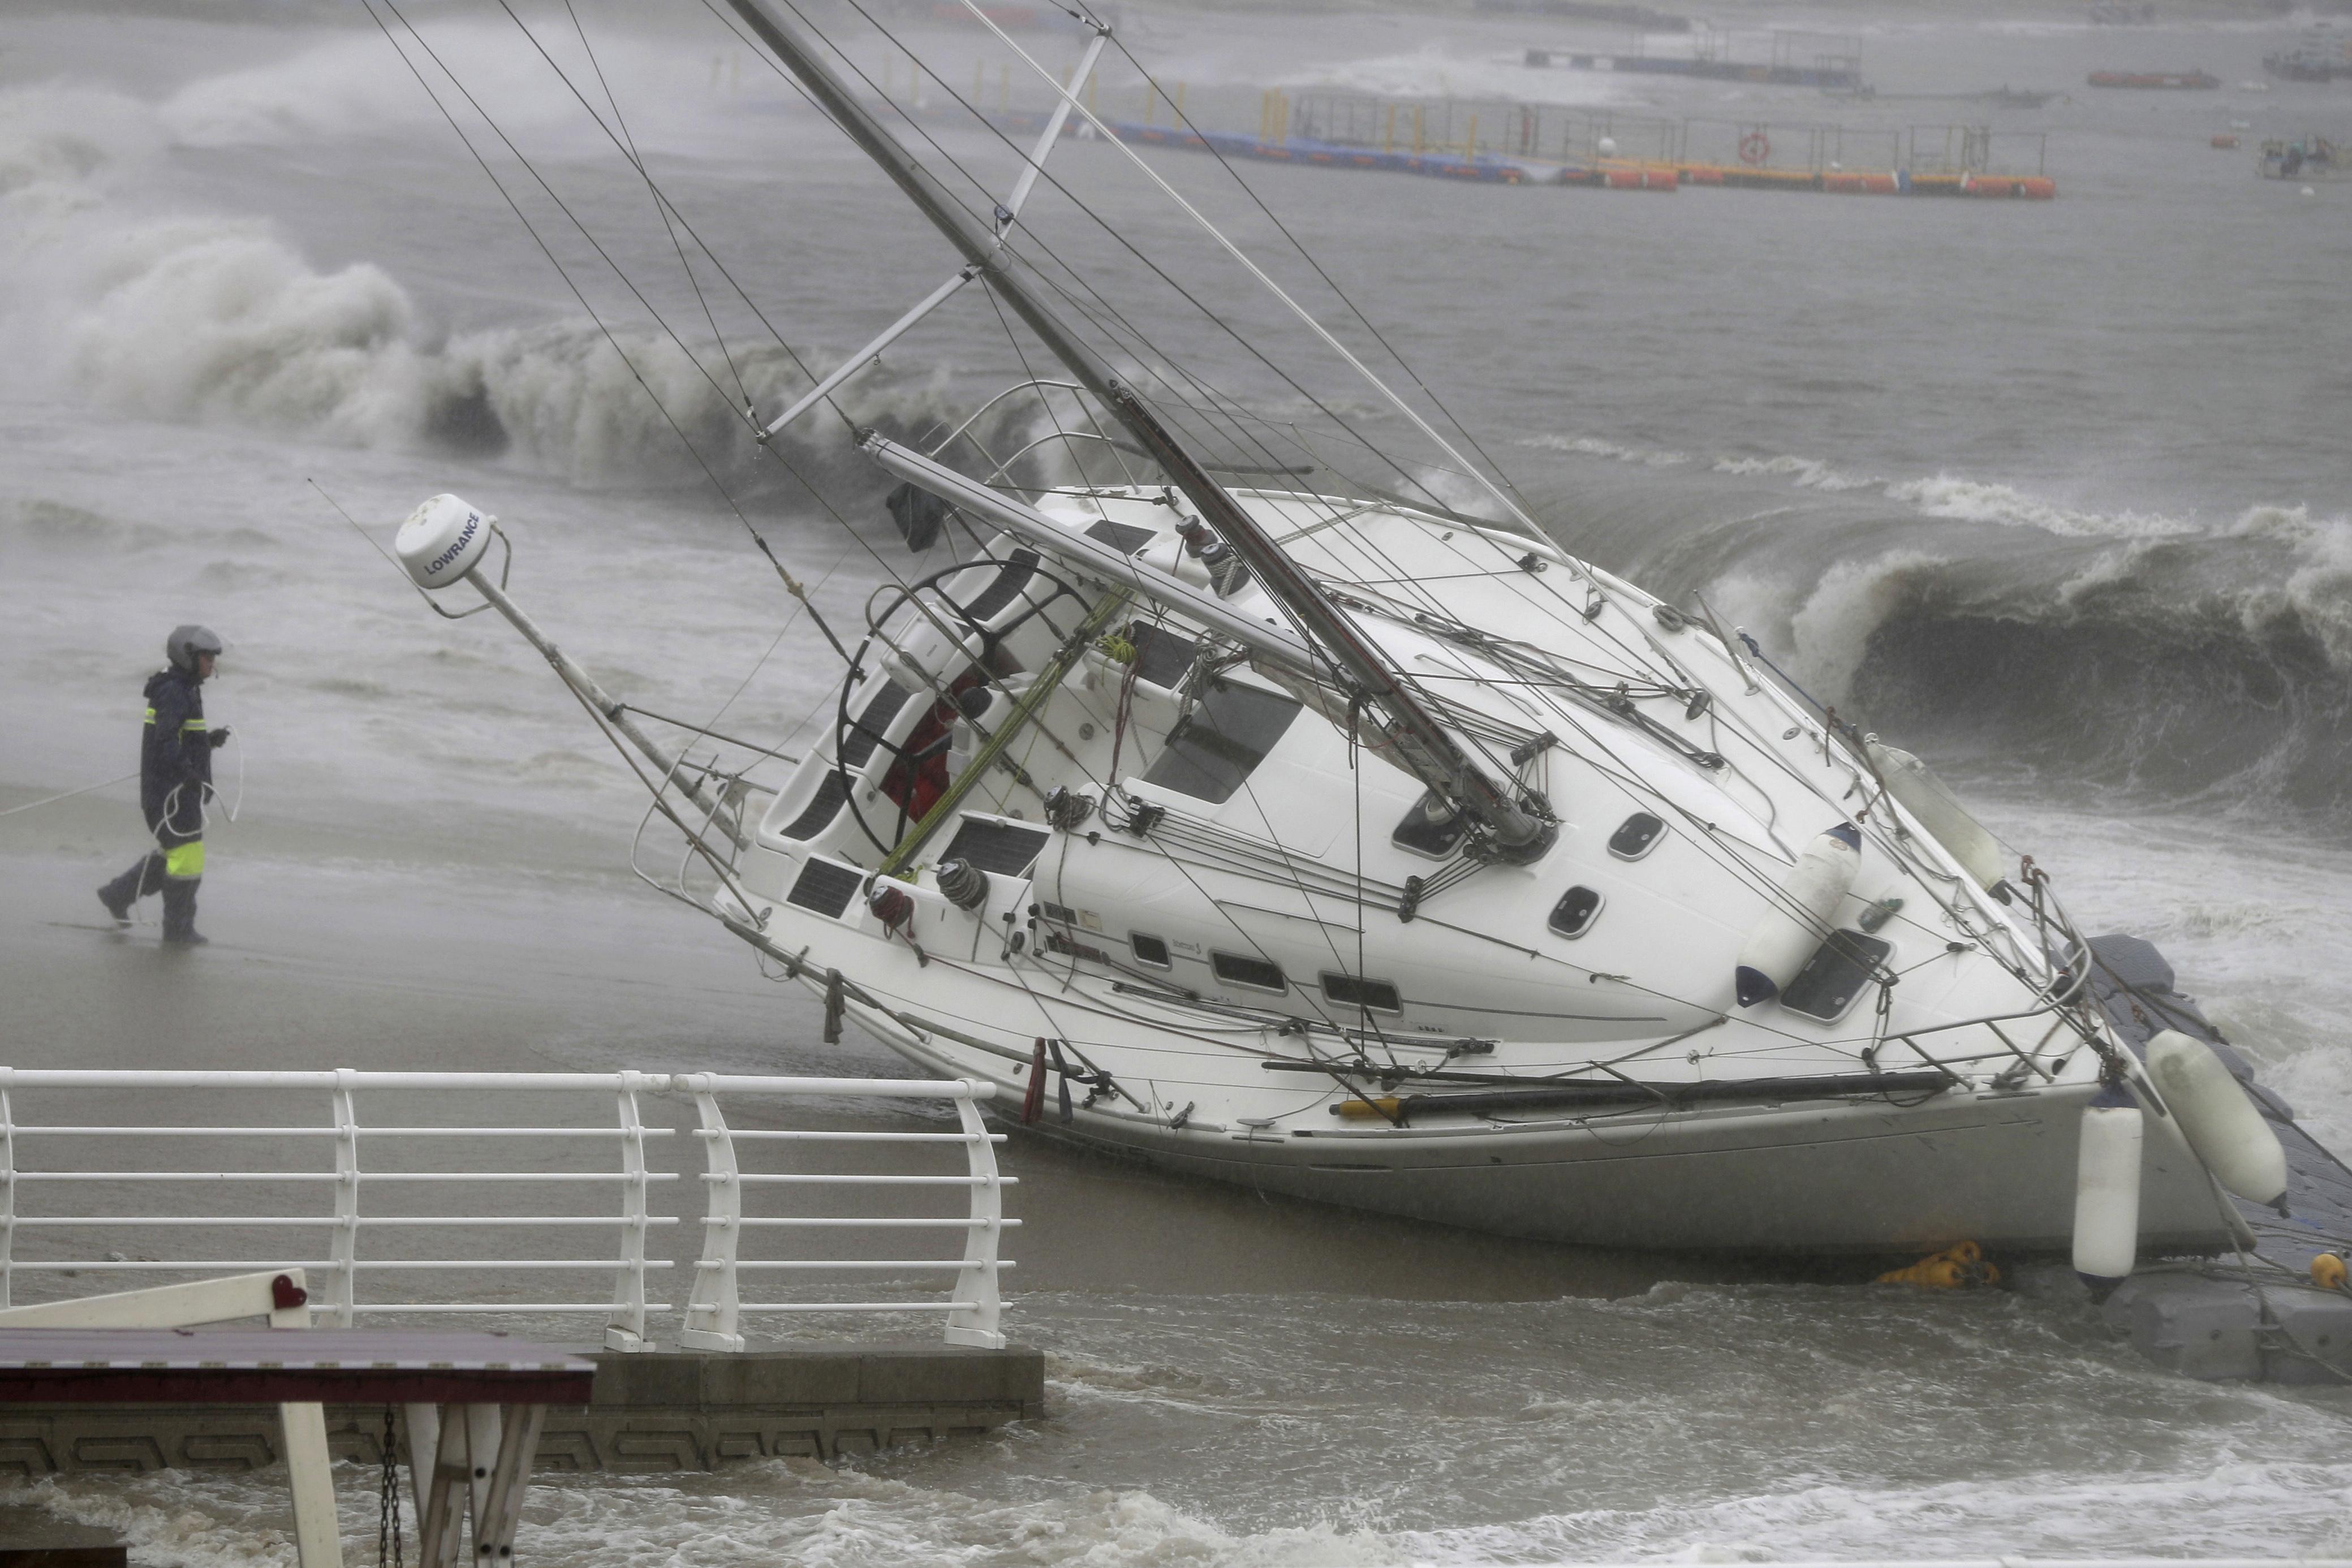 Powerful typhoon causes injuries, damage in South Korea